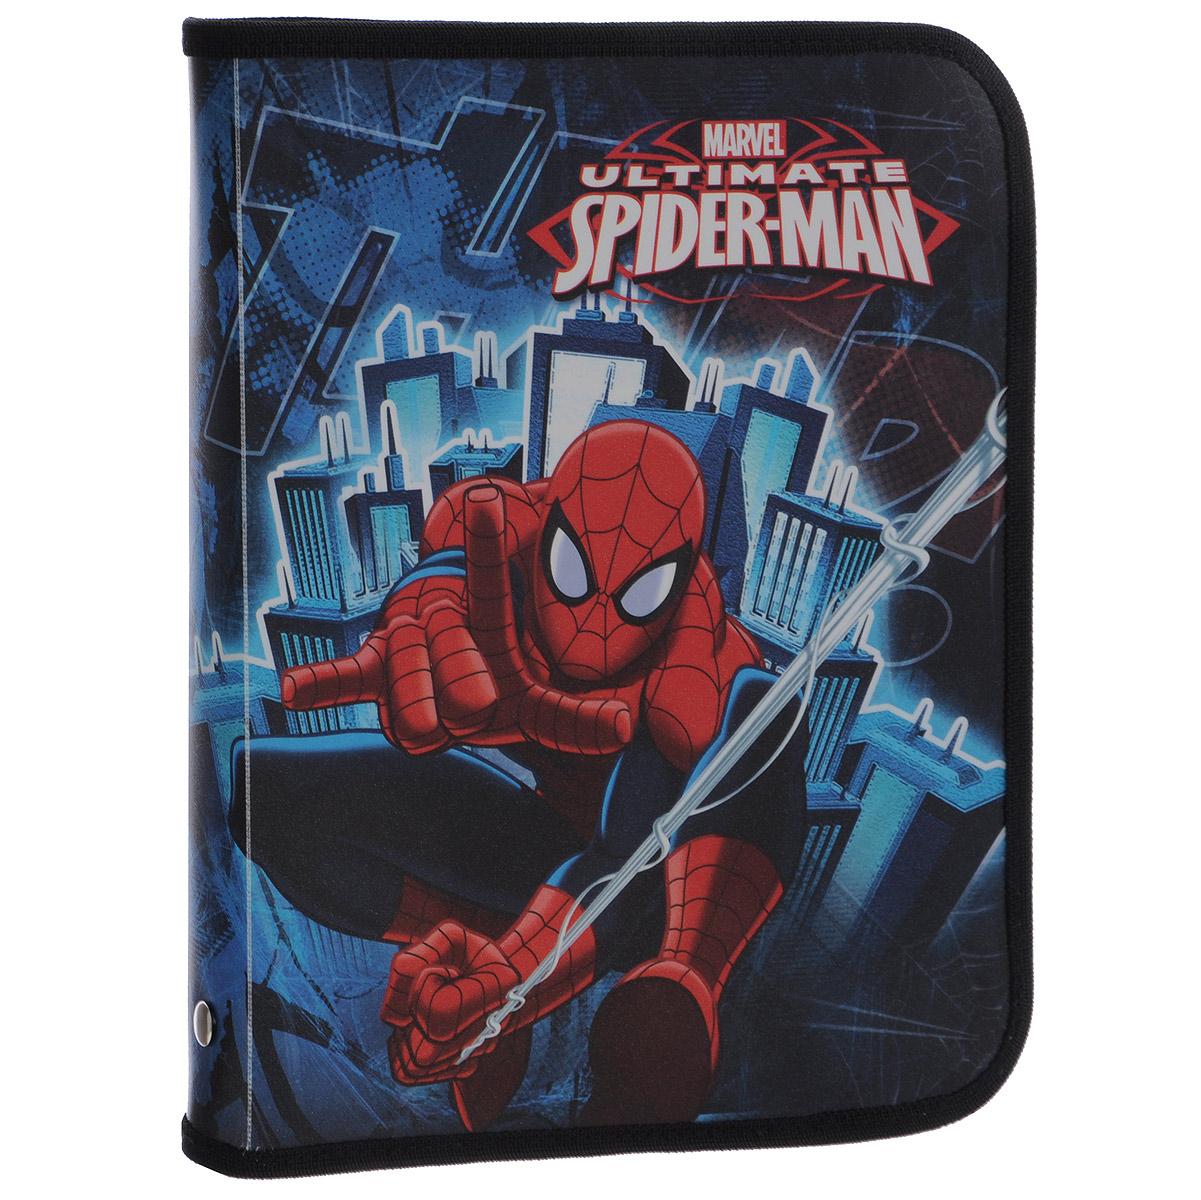 ����� ��� �������� Spider-man Classic, ����: �����, �������. ������ �5 - Spider-ManSMCB-US1-CPBFL����� ��� �������� Spider-man Classic- ��� ������� � �������������� ����������. � ����� ���� ������������� ���������, ������� �������� �������� ��� �������� ��������� ����� ������� �5, � ����� �������� �������� � ���������� ���������������. ����� ��������� ���������� ������������� ������ ����������� Spider-man Classic. ����� ����������� �� �������� ��������. ���� ����� ���������� ������ ����������� �������. �������� ��������-������ ������ ����� ������������ ������������ ������� � ������������� �������, �������� ������ ������� � ������� �����. ����� ��������� � ������������� � ������� �������� ���� ������ � �������� �� �� �����������, ���� � �����.